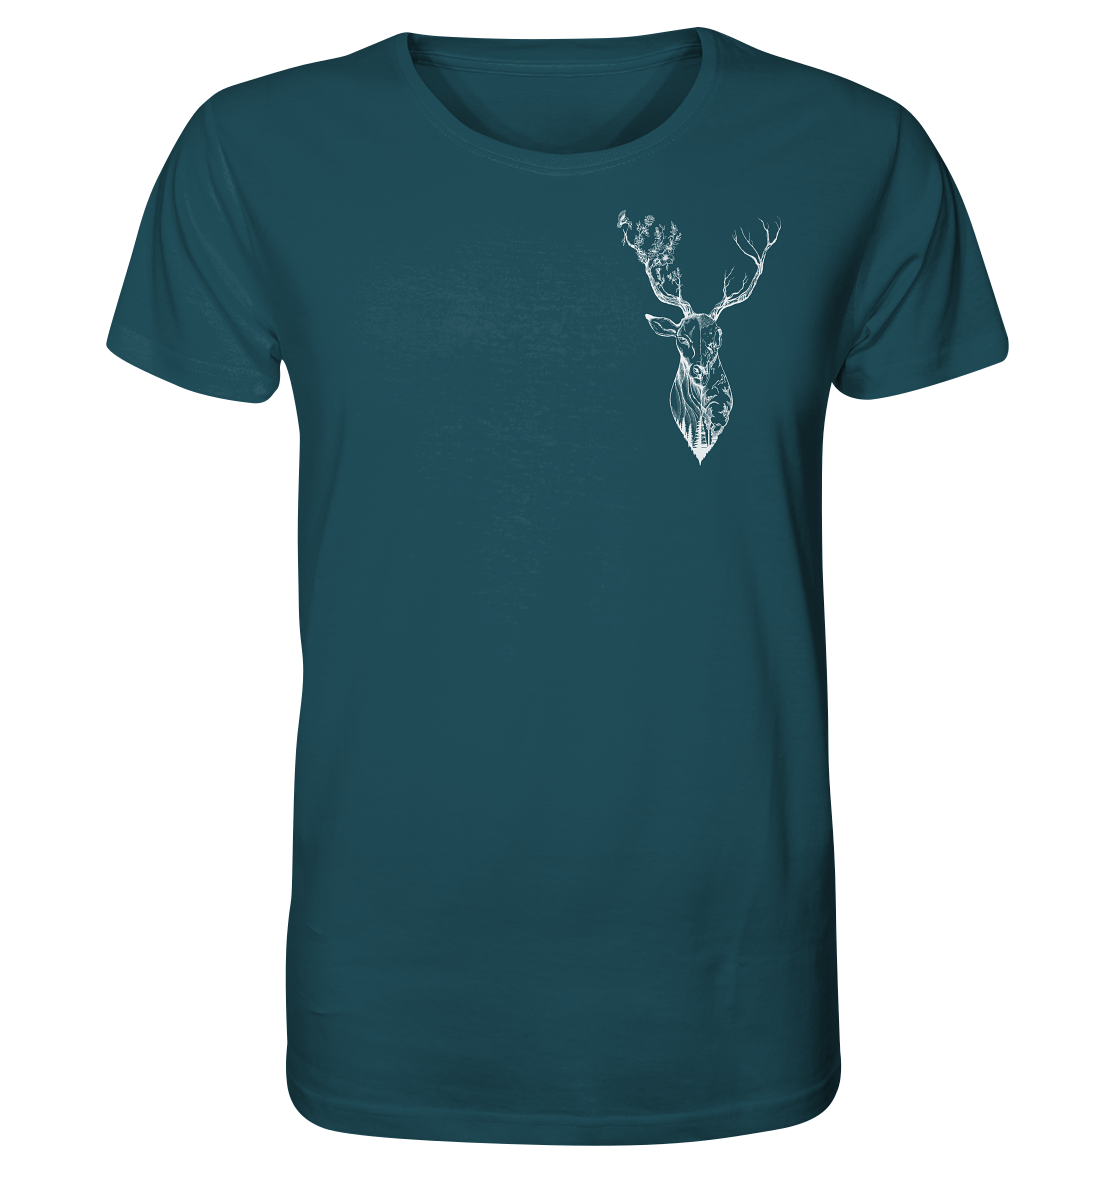 front-organic-shirt-204d59-1116x-6.png